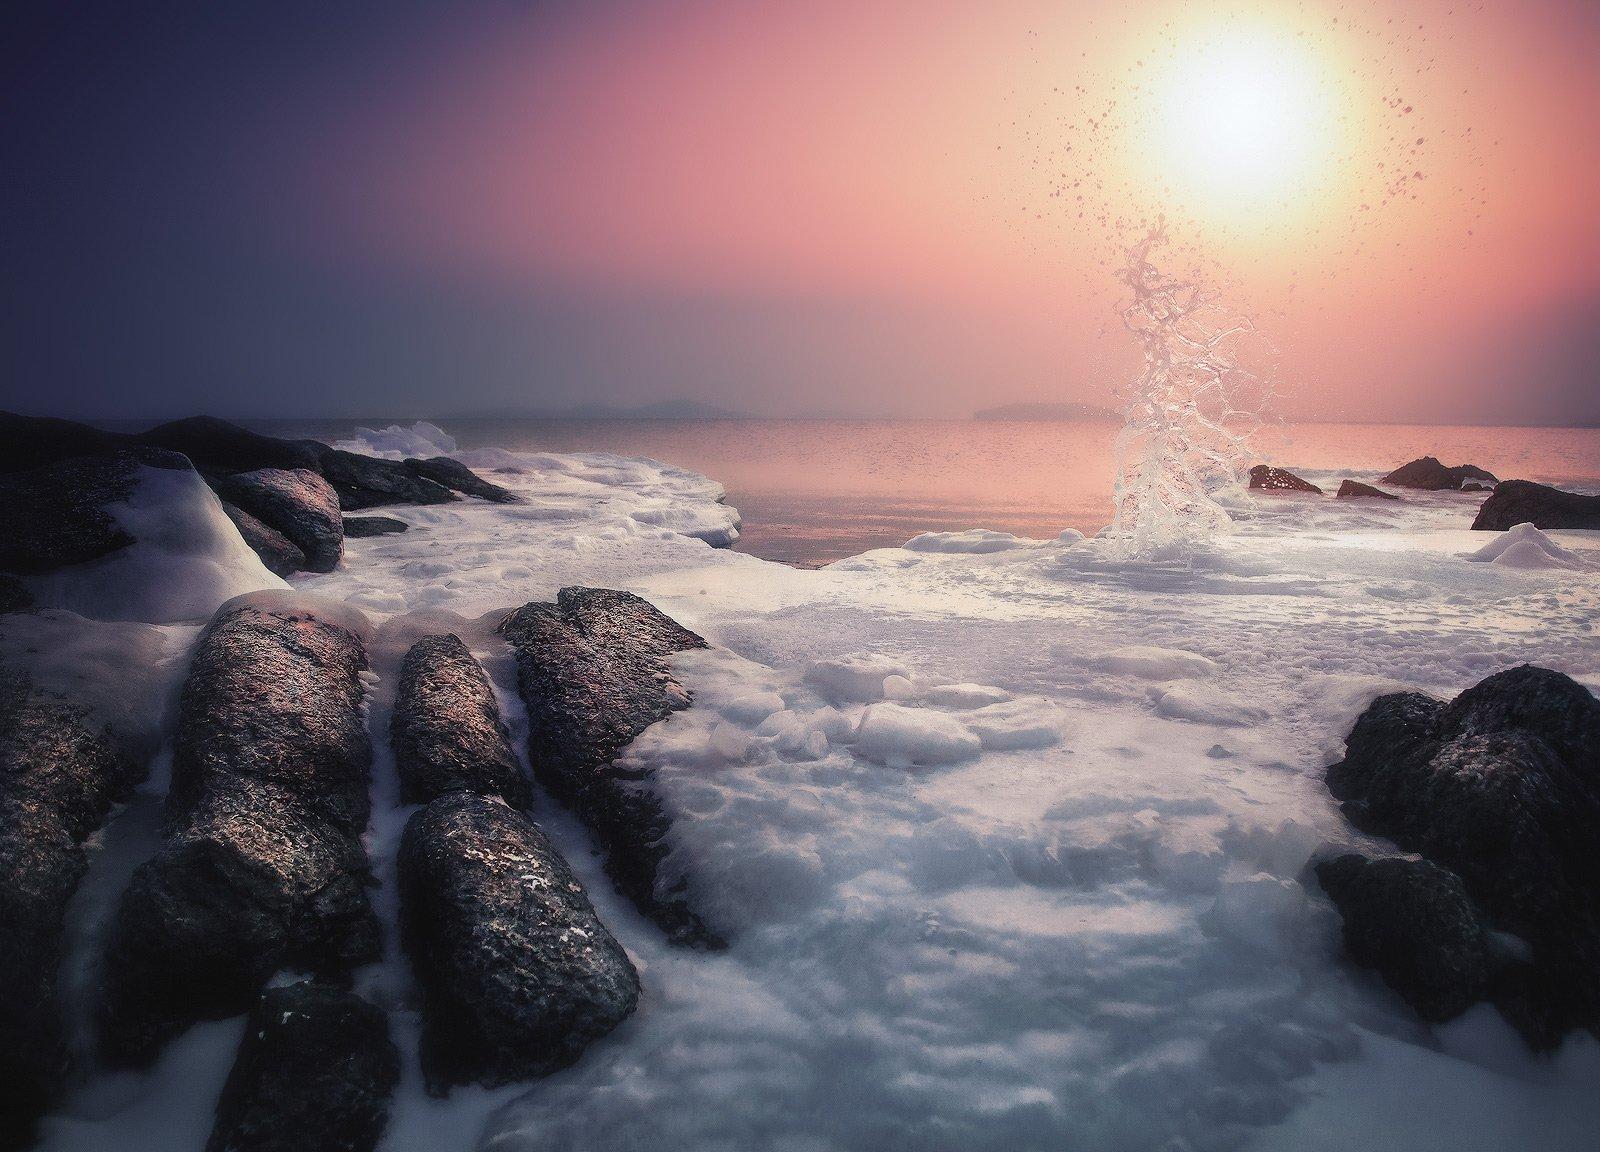 Вечер, Зима, Камни, Море, Андрей Кровлин